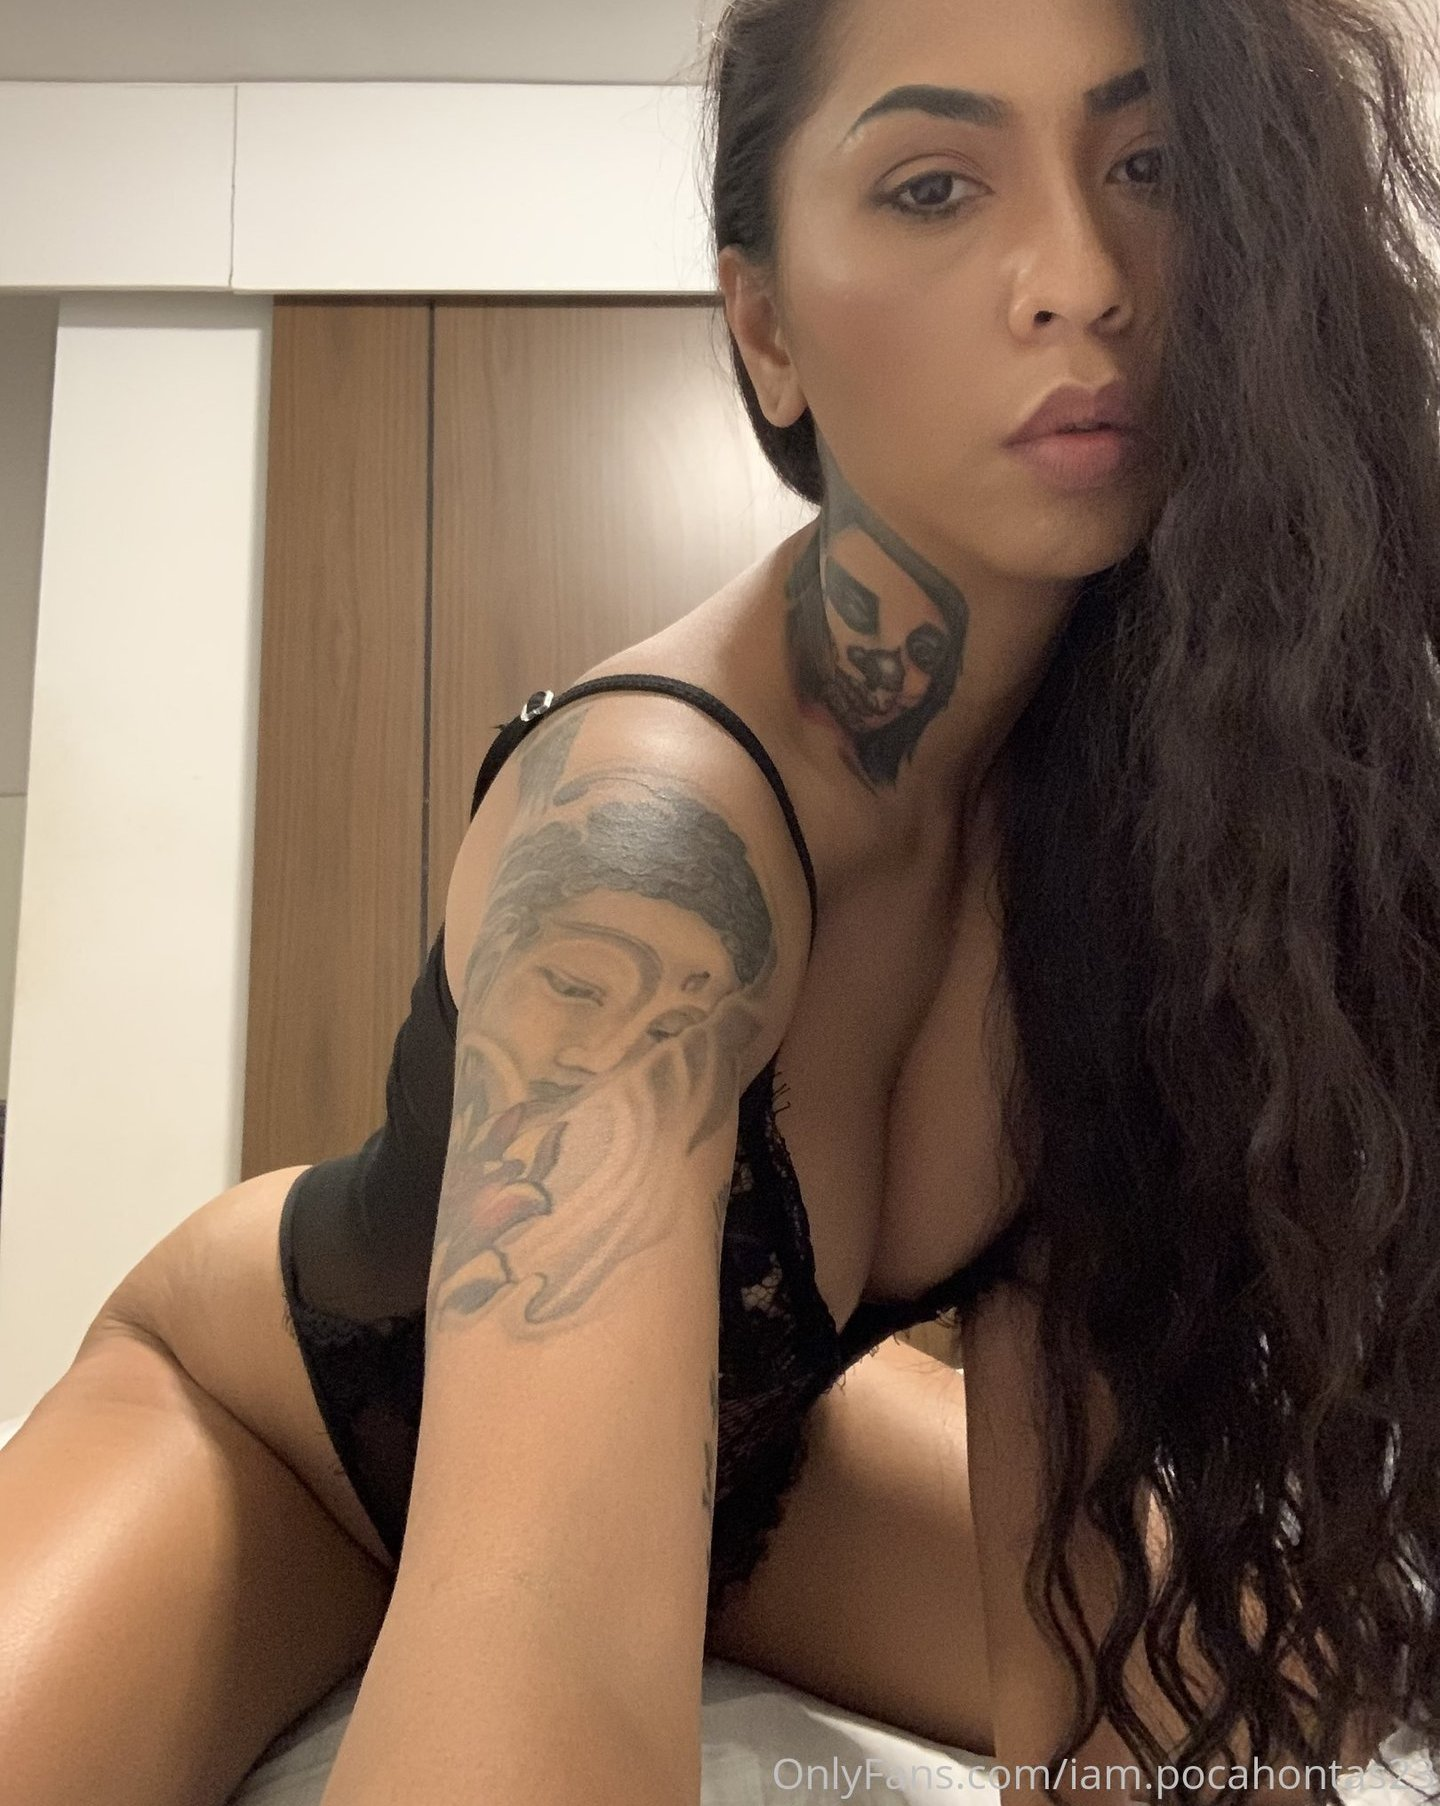 Asian Thai Girl Iampocahontas Onlyfans Nude Leaks 0020